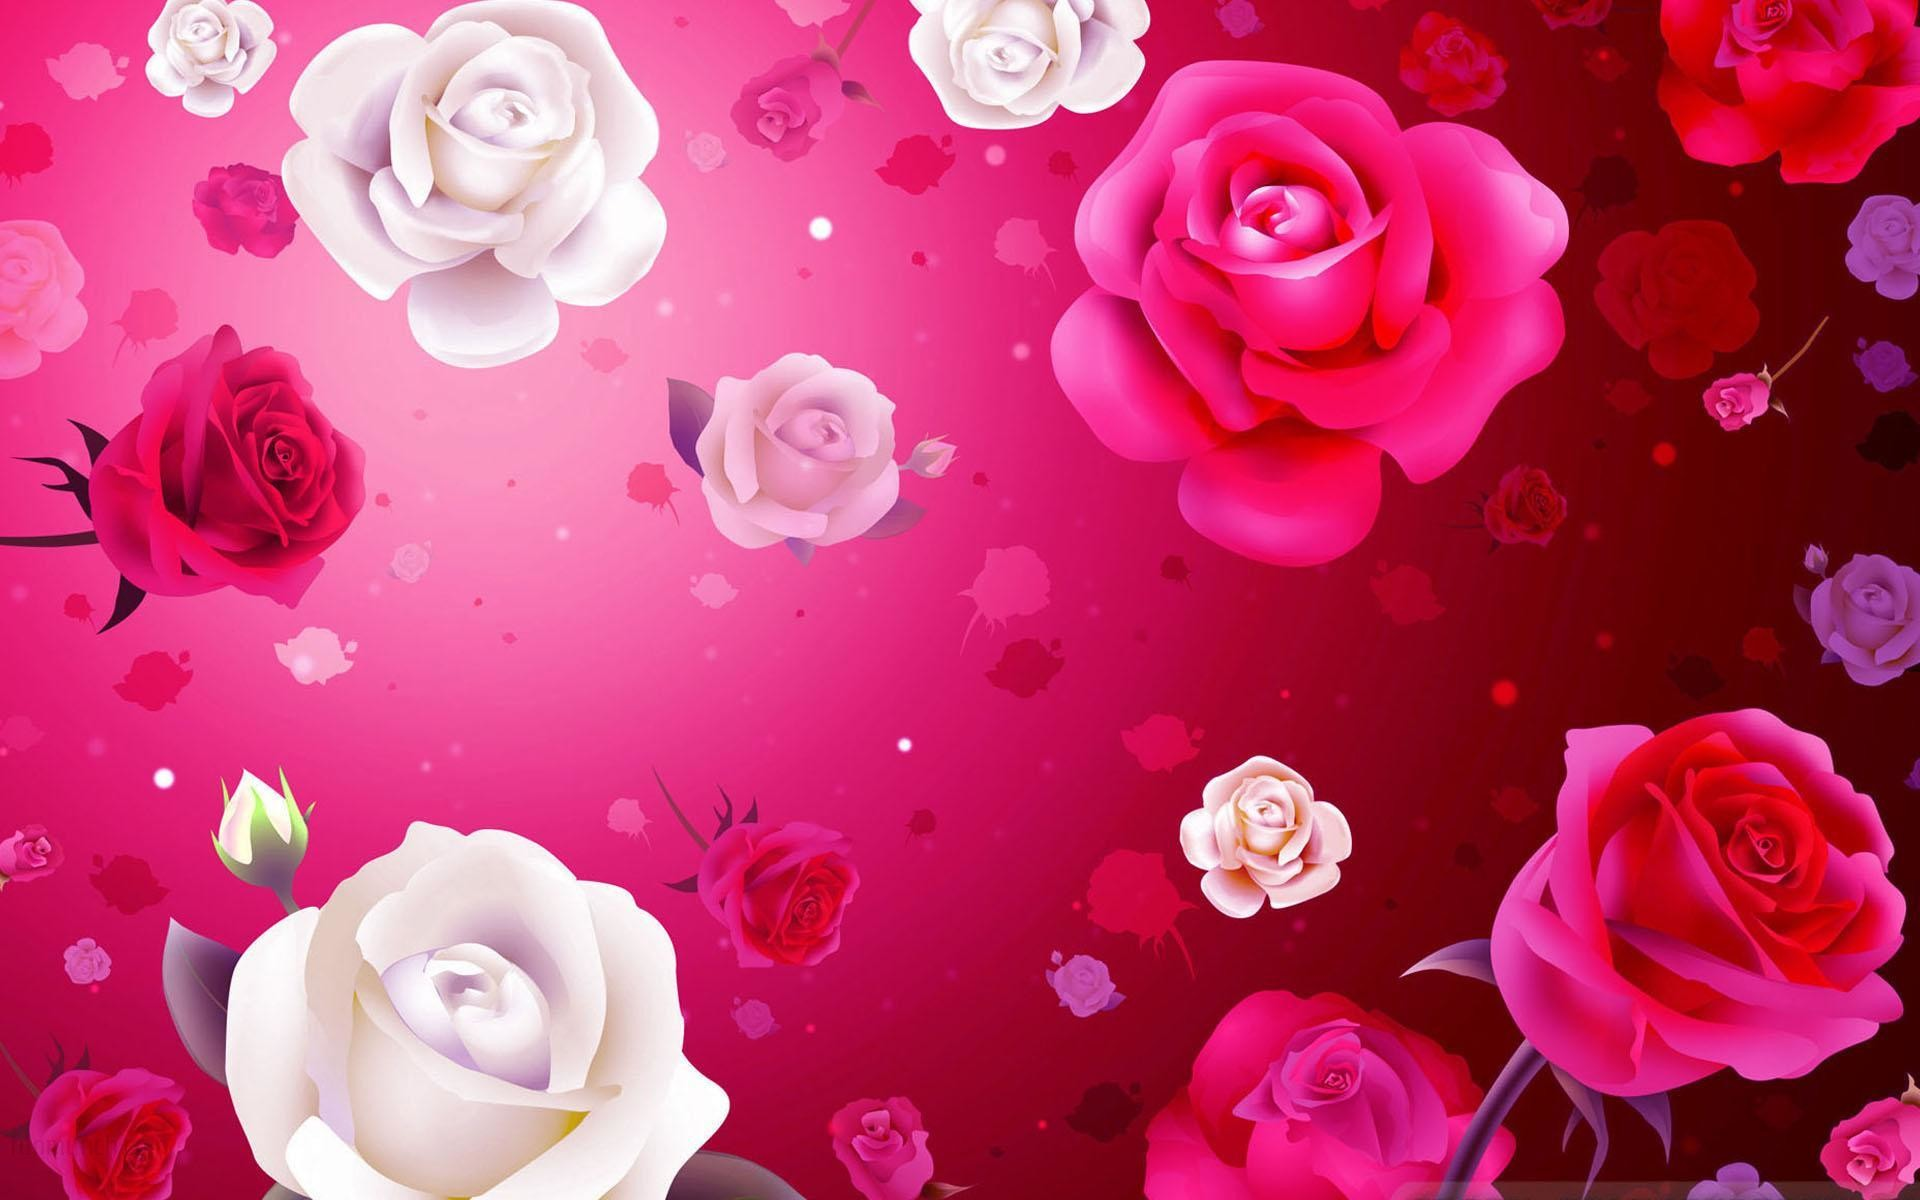 Valentines Day Desktop Wallpaper 8518 Hd Wallpapers in Celebrations .